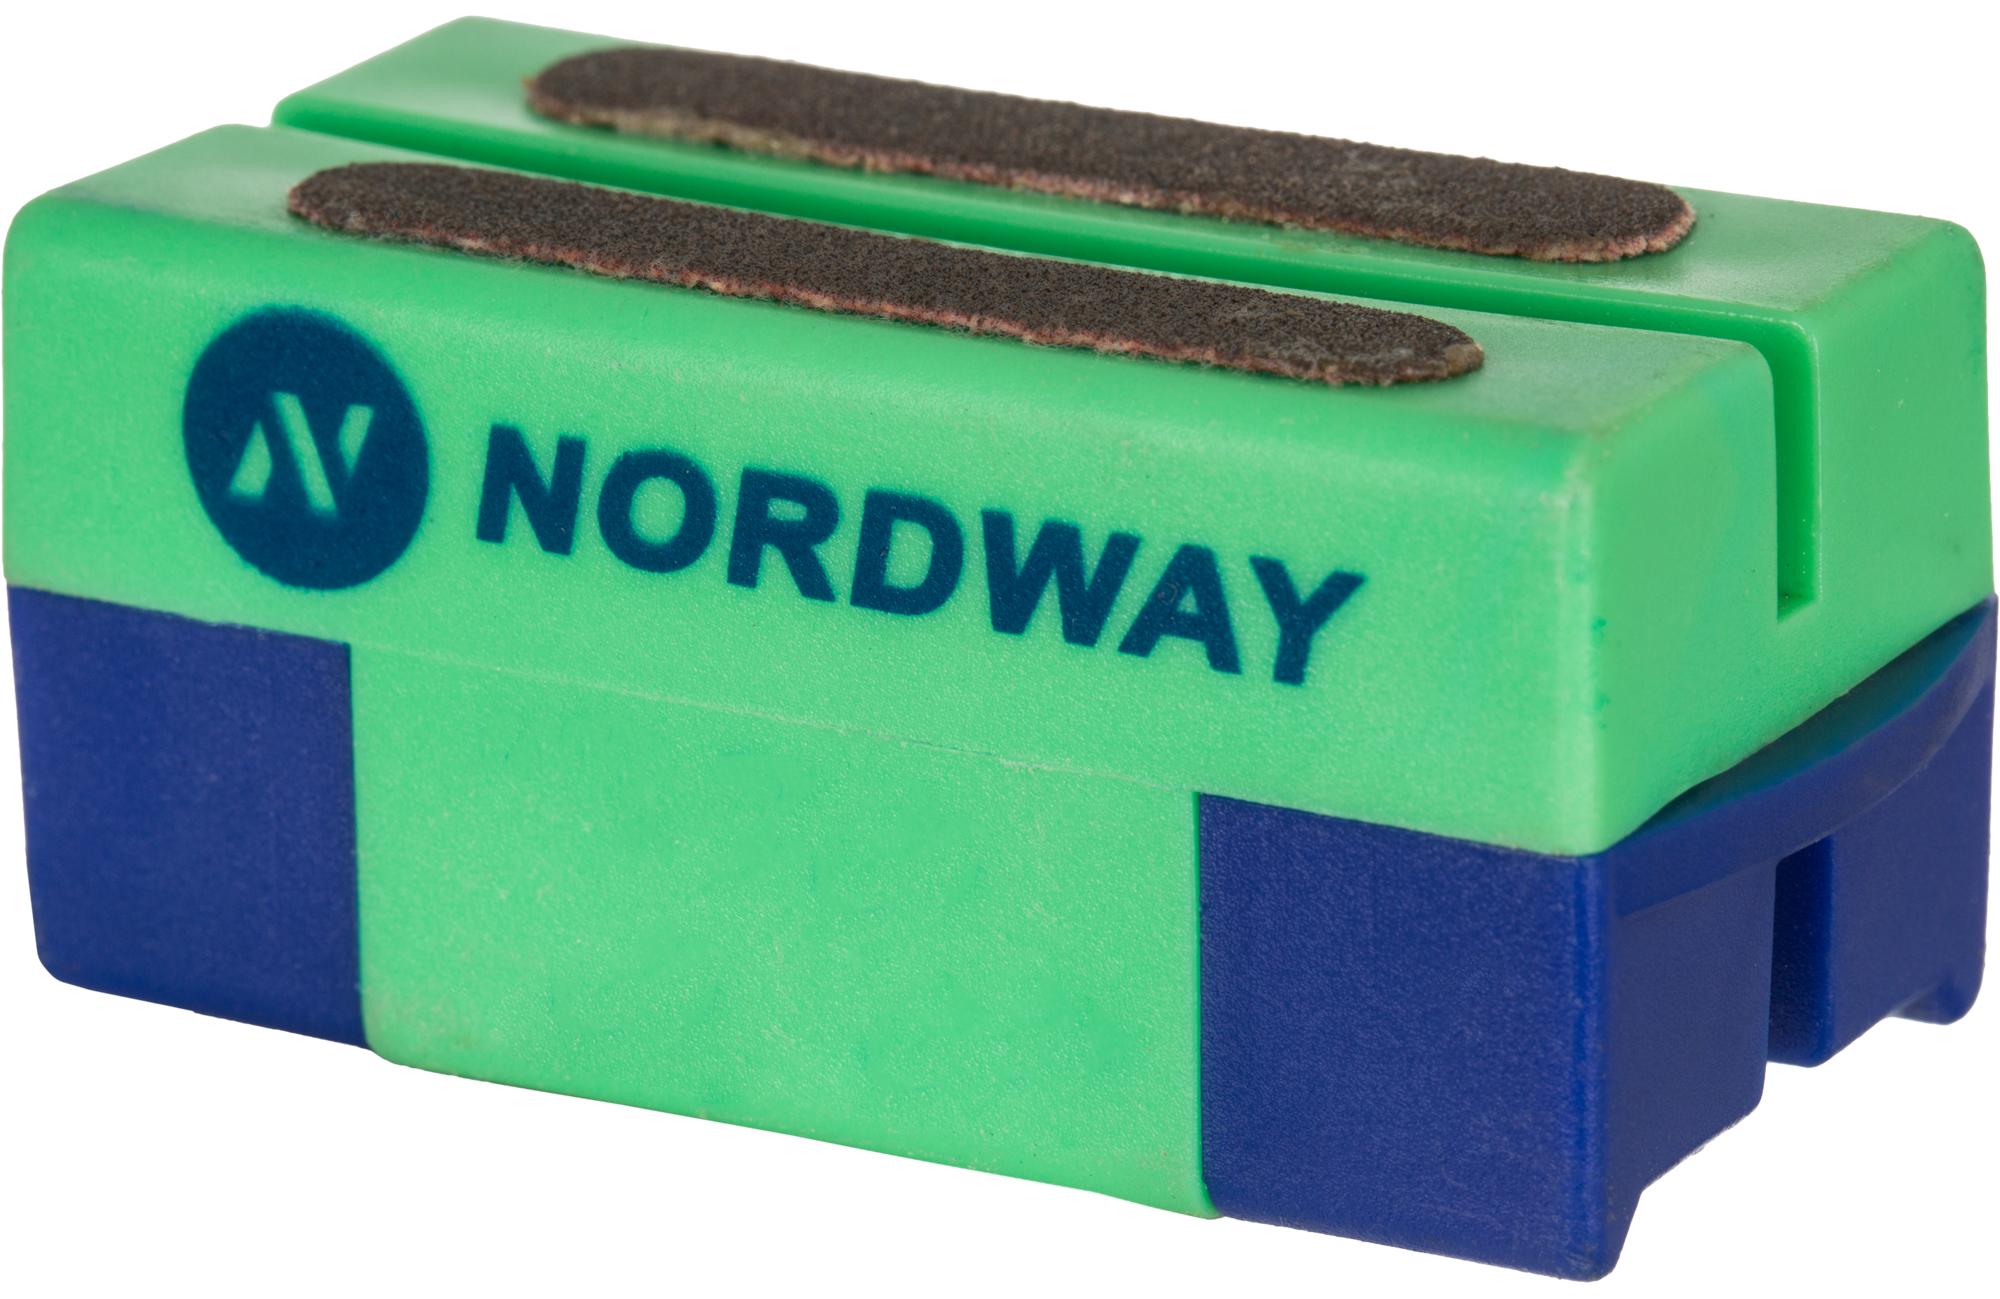 Nordway Приспособление для заточки коньков Nordway мягкий чехол для лезвий nordway nblcl 7